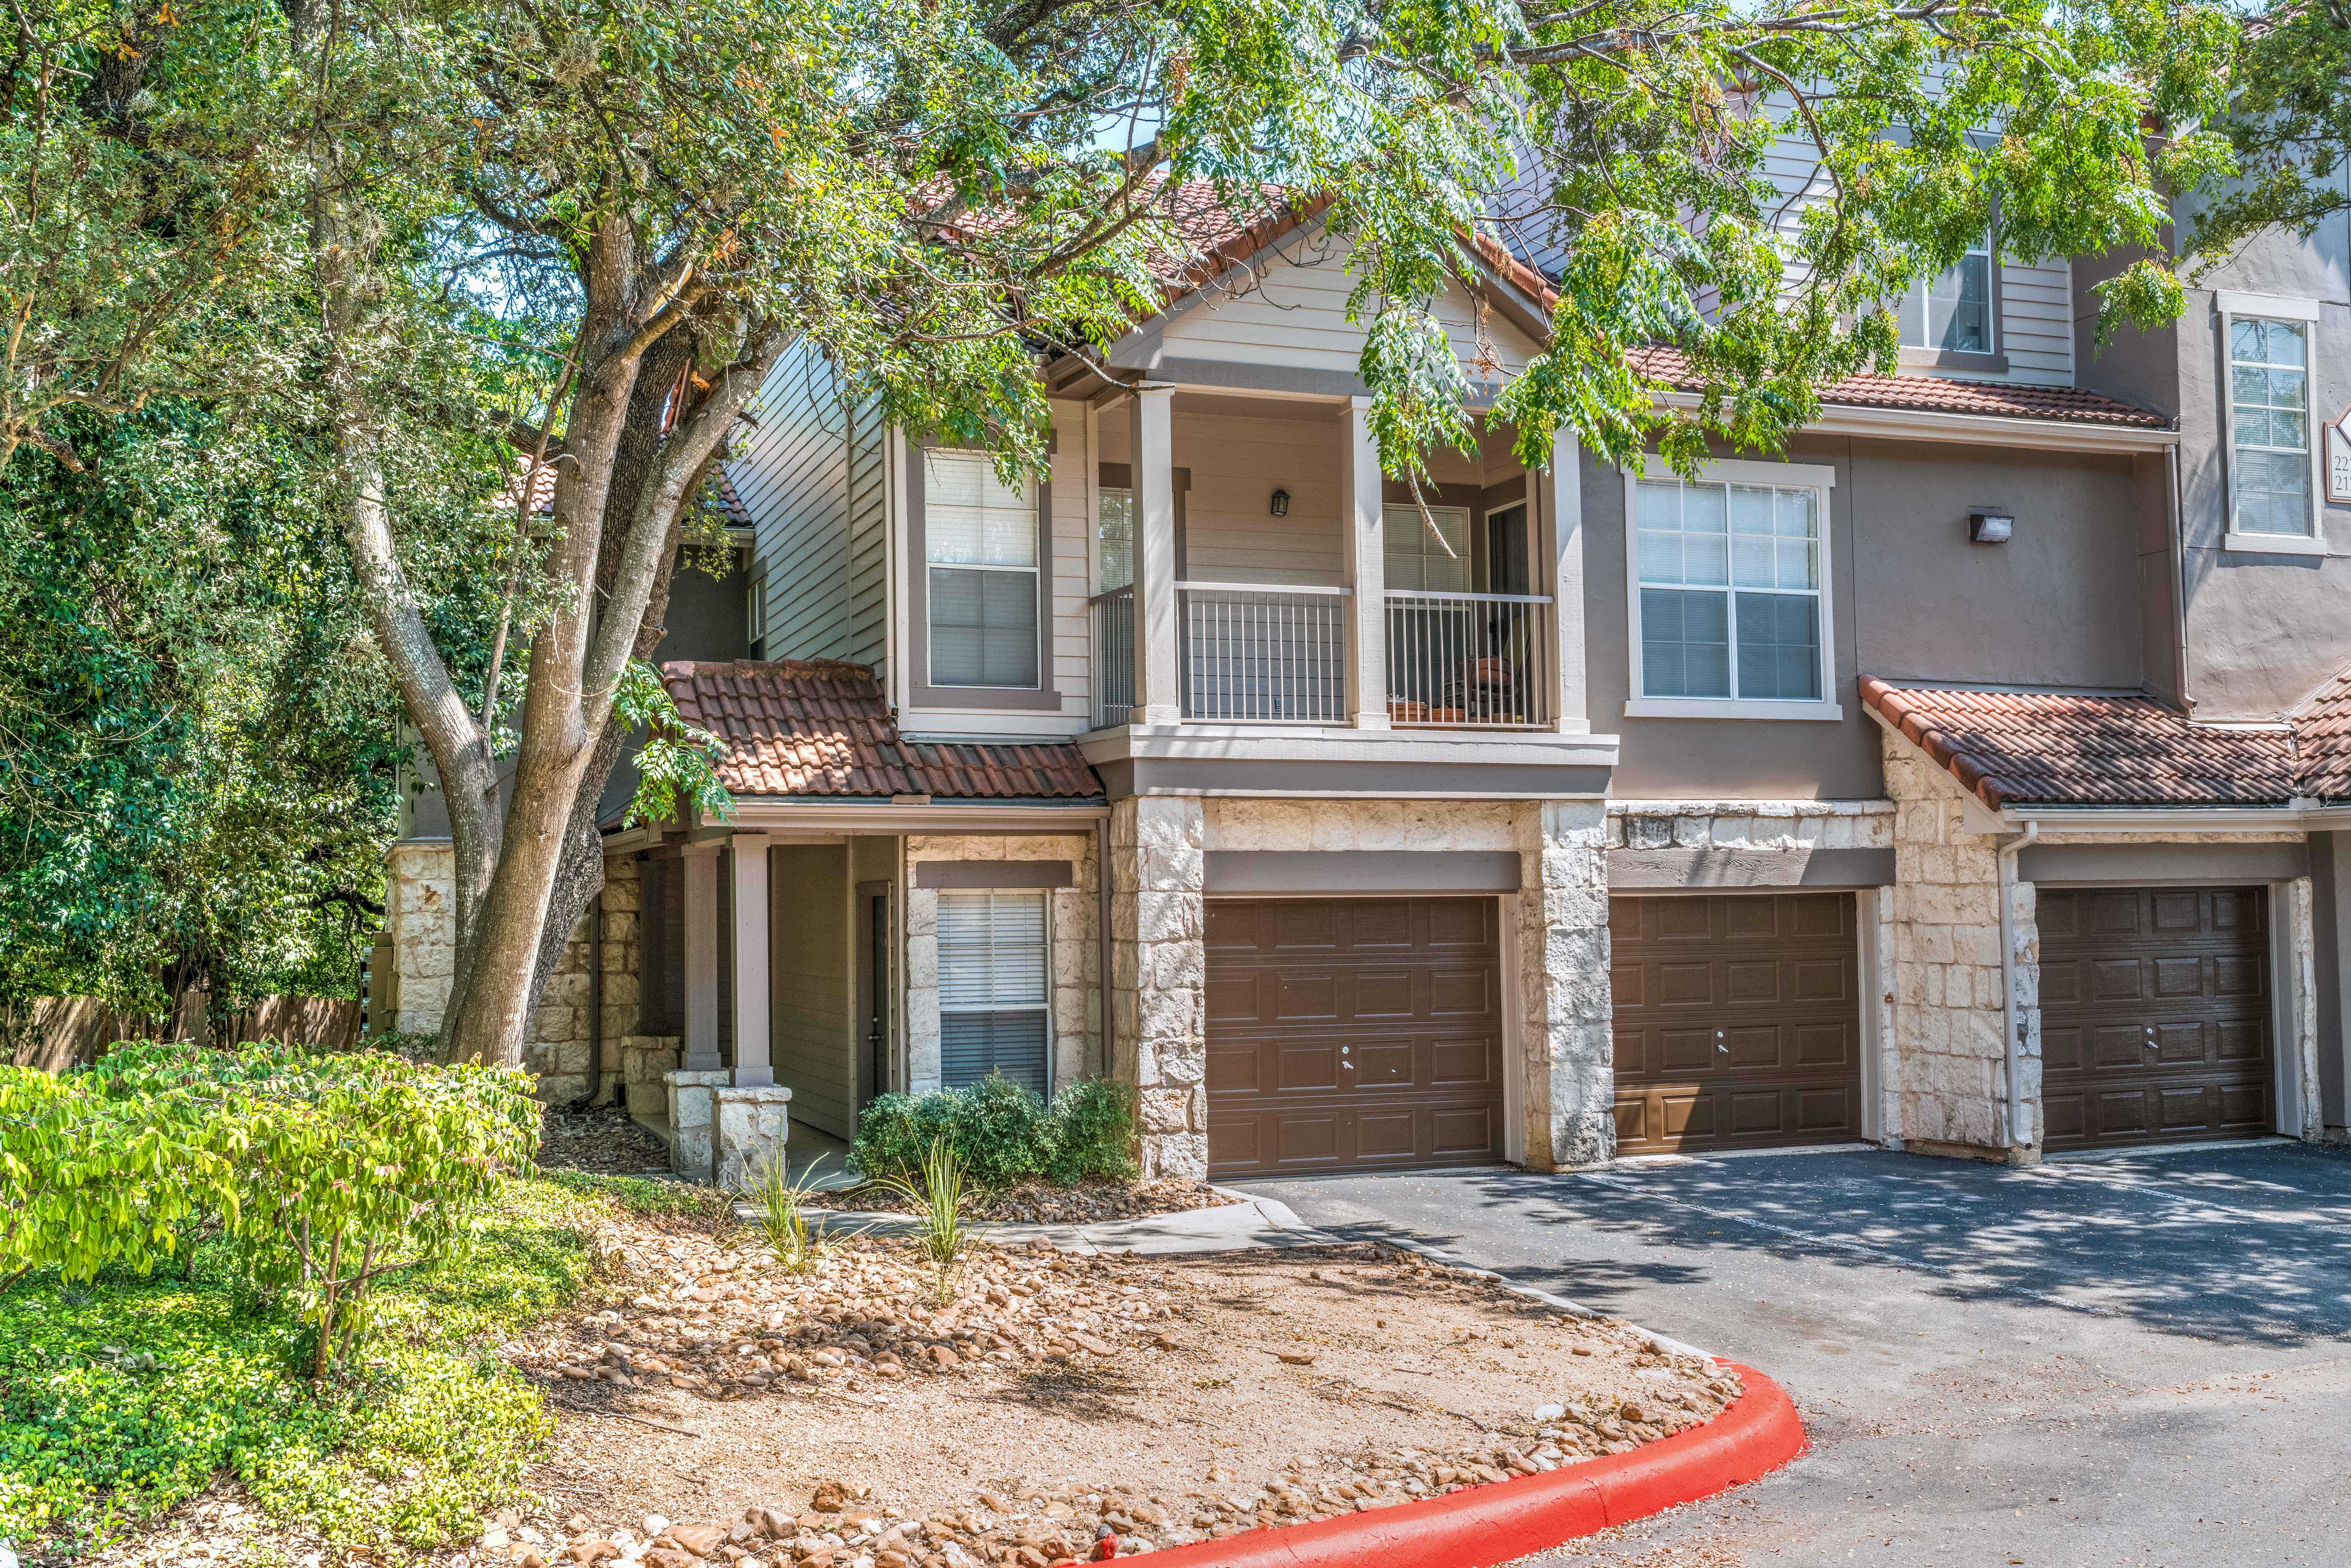 Ventana Apartments 11020 Huebner Oaks San Antonio, TX Apartments - MapQuest